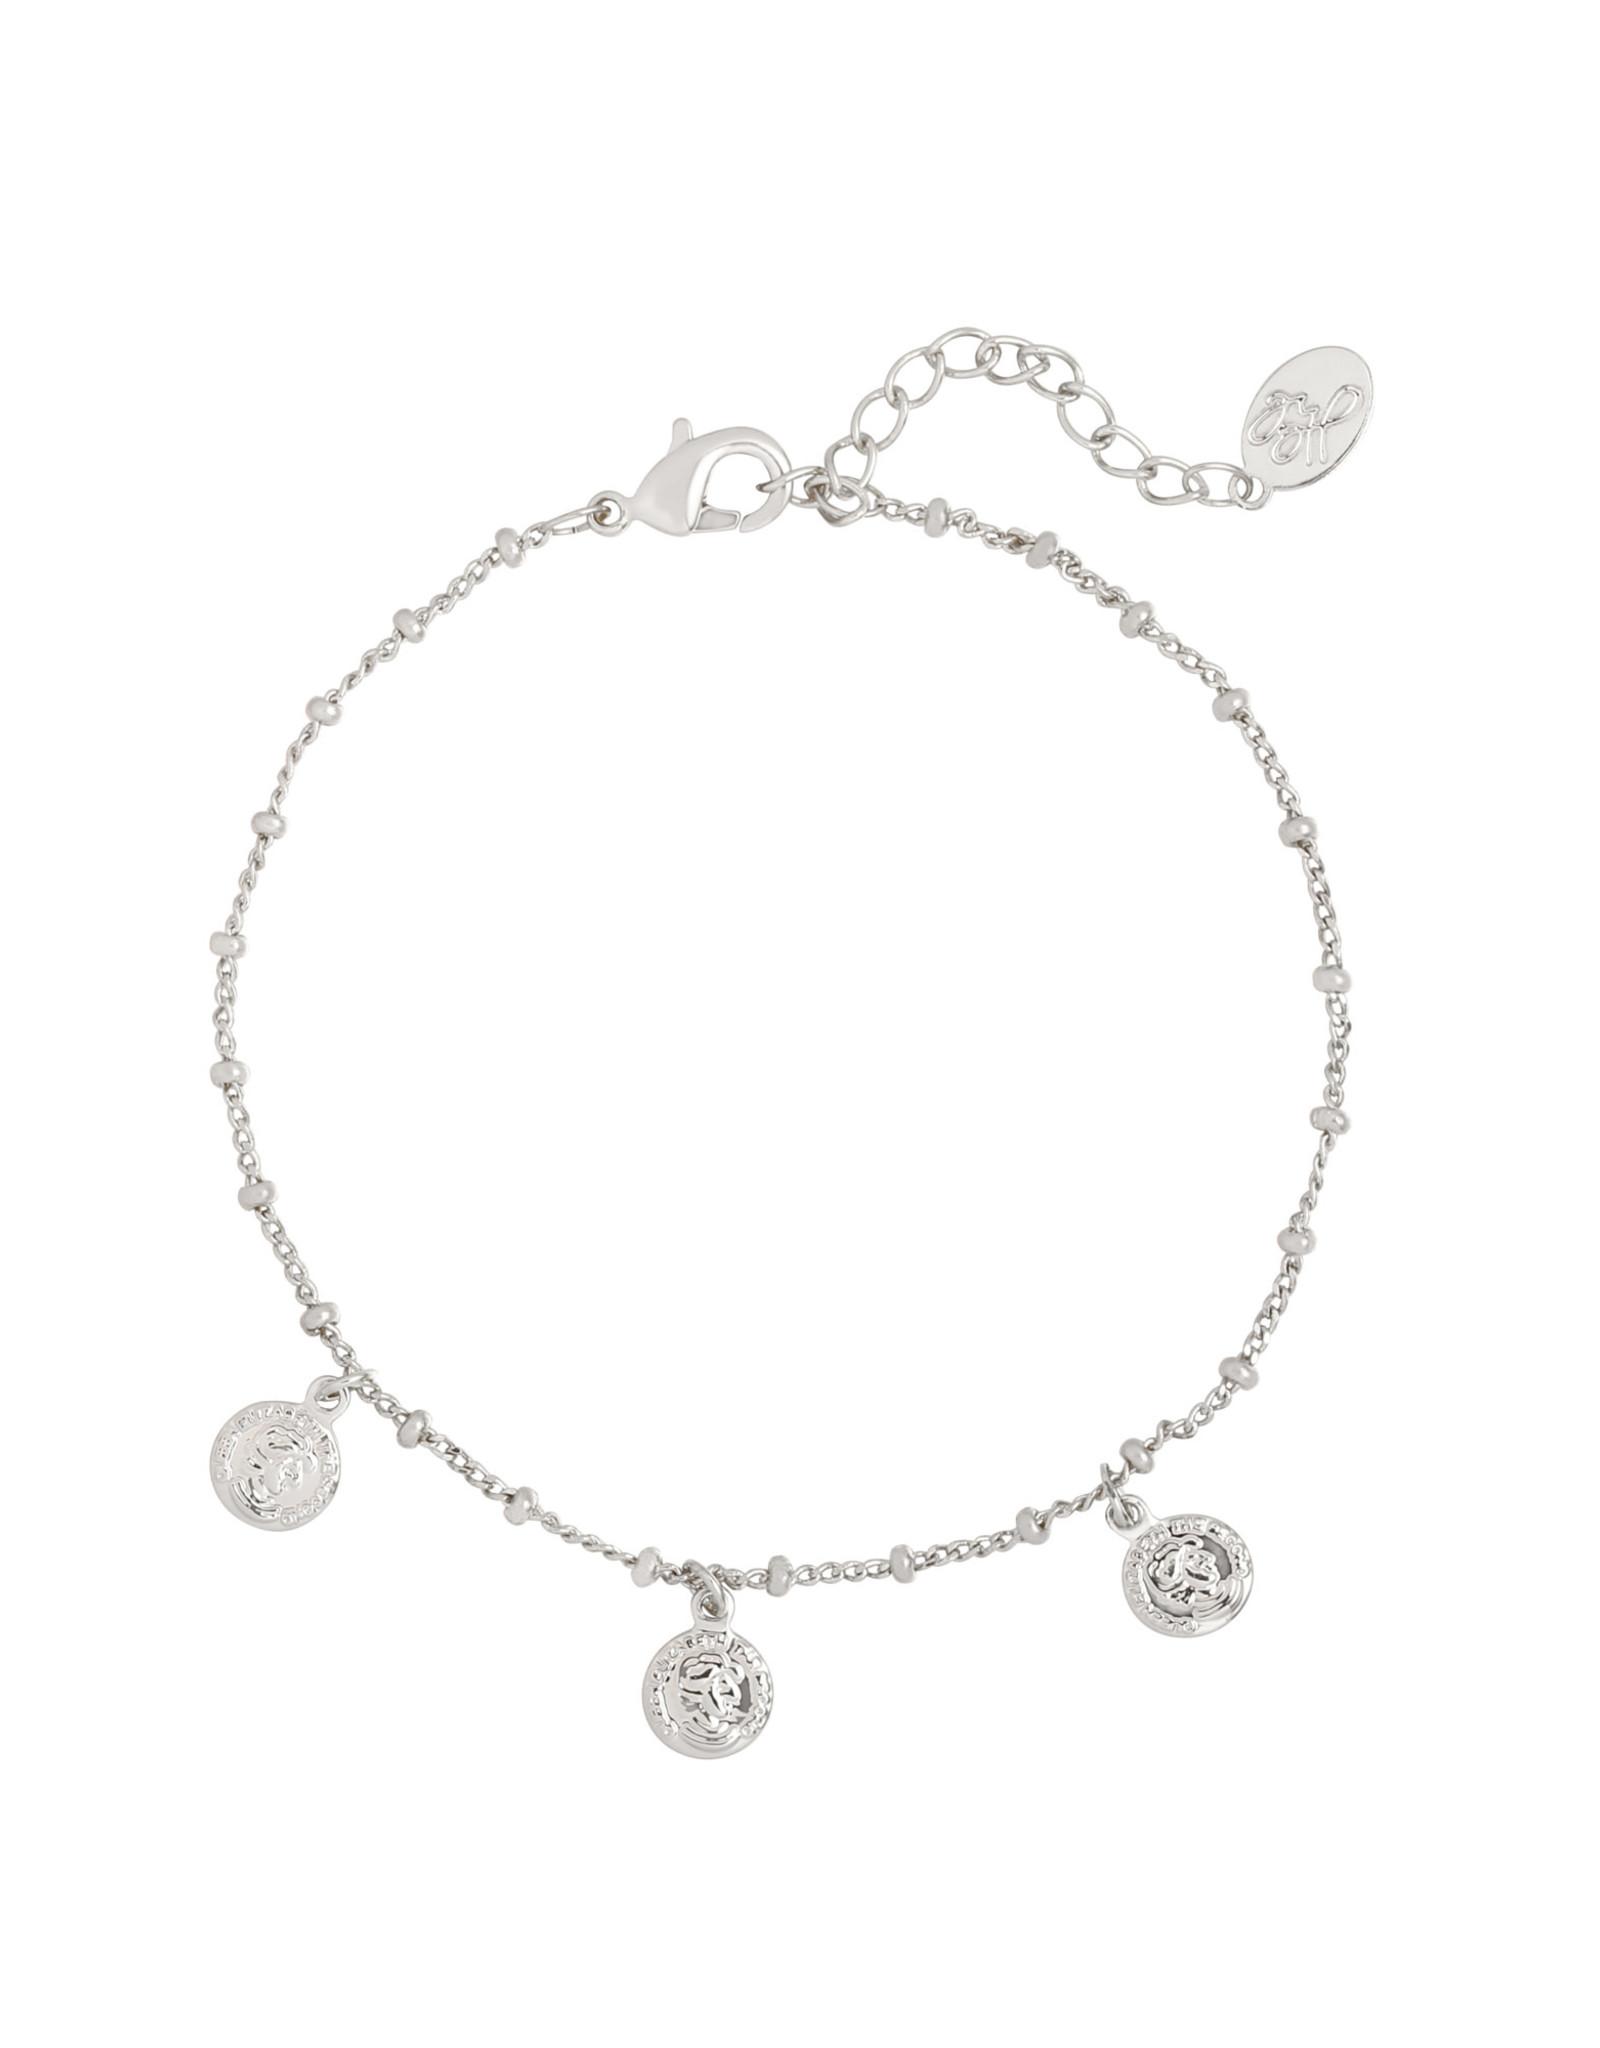 Bracelet cute coin silver